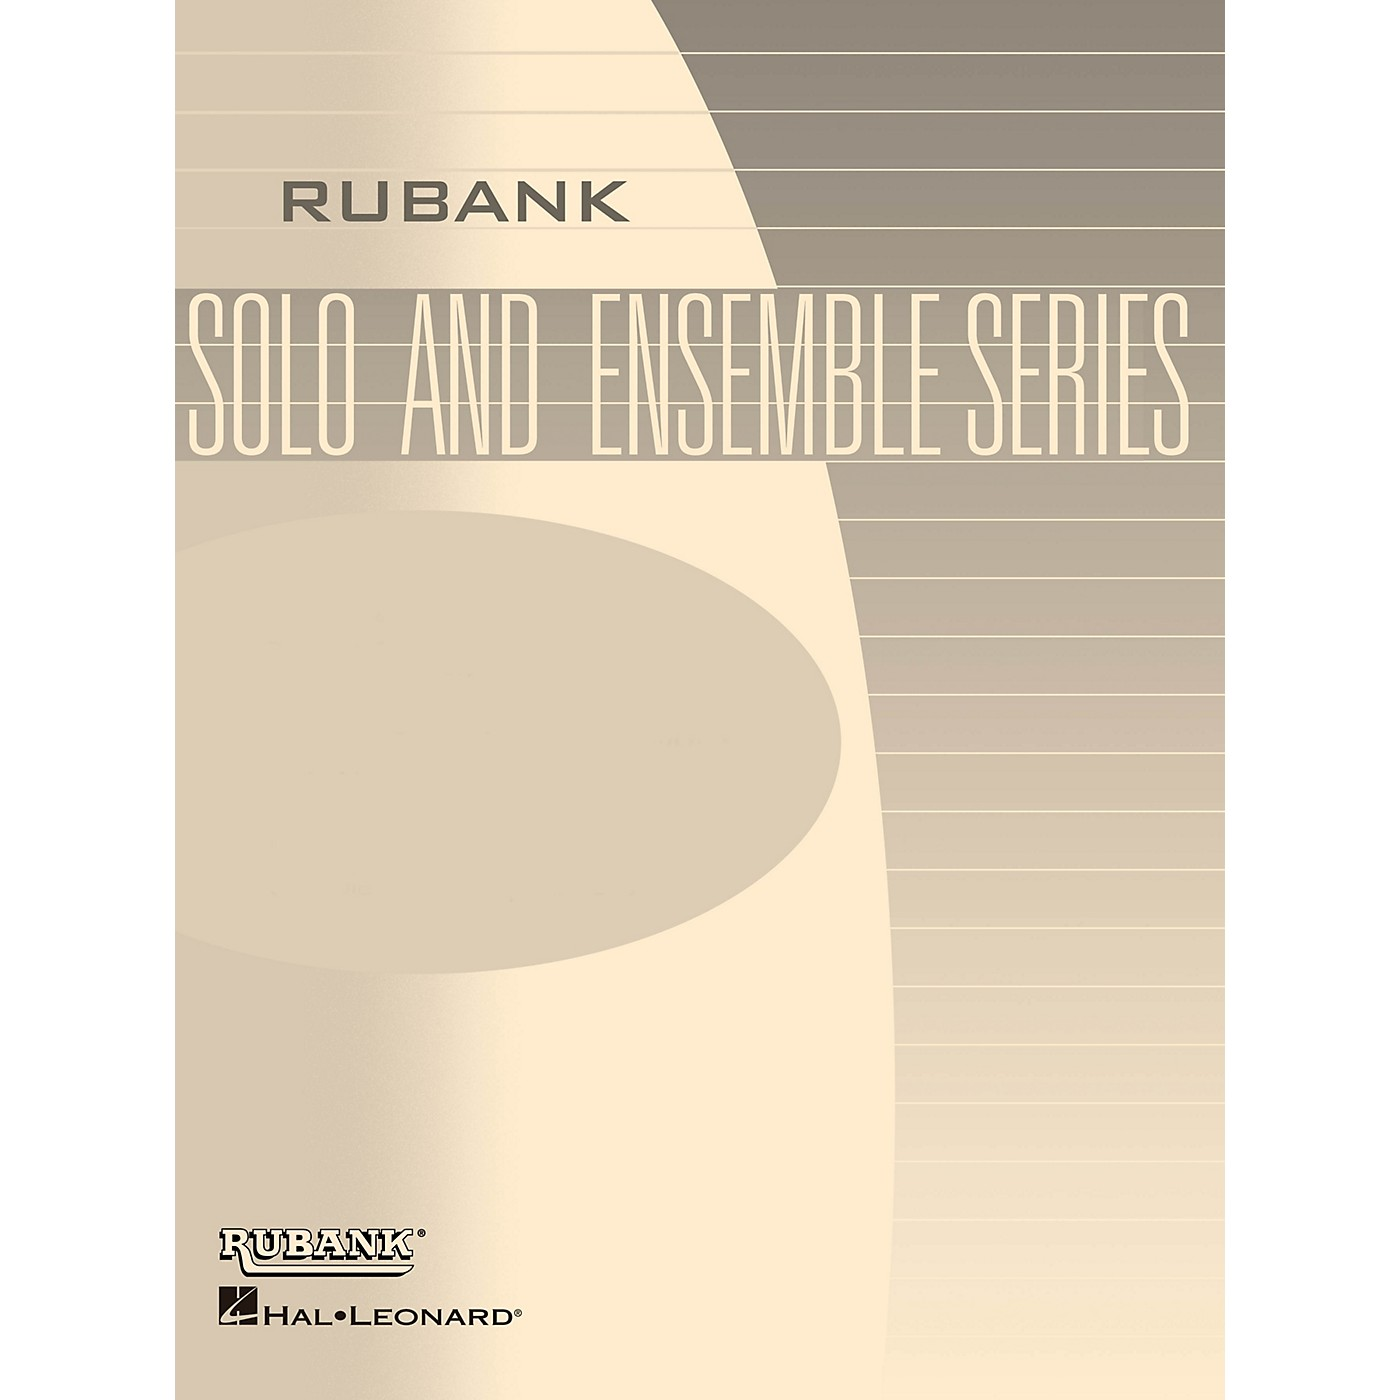 Rubank Publications Men About Town (Trombone Trio with Piano - Grade 2.5) Rubank Solo/Ensemble Sheet Series thumbnail